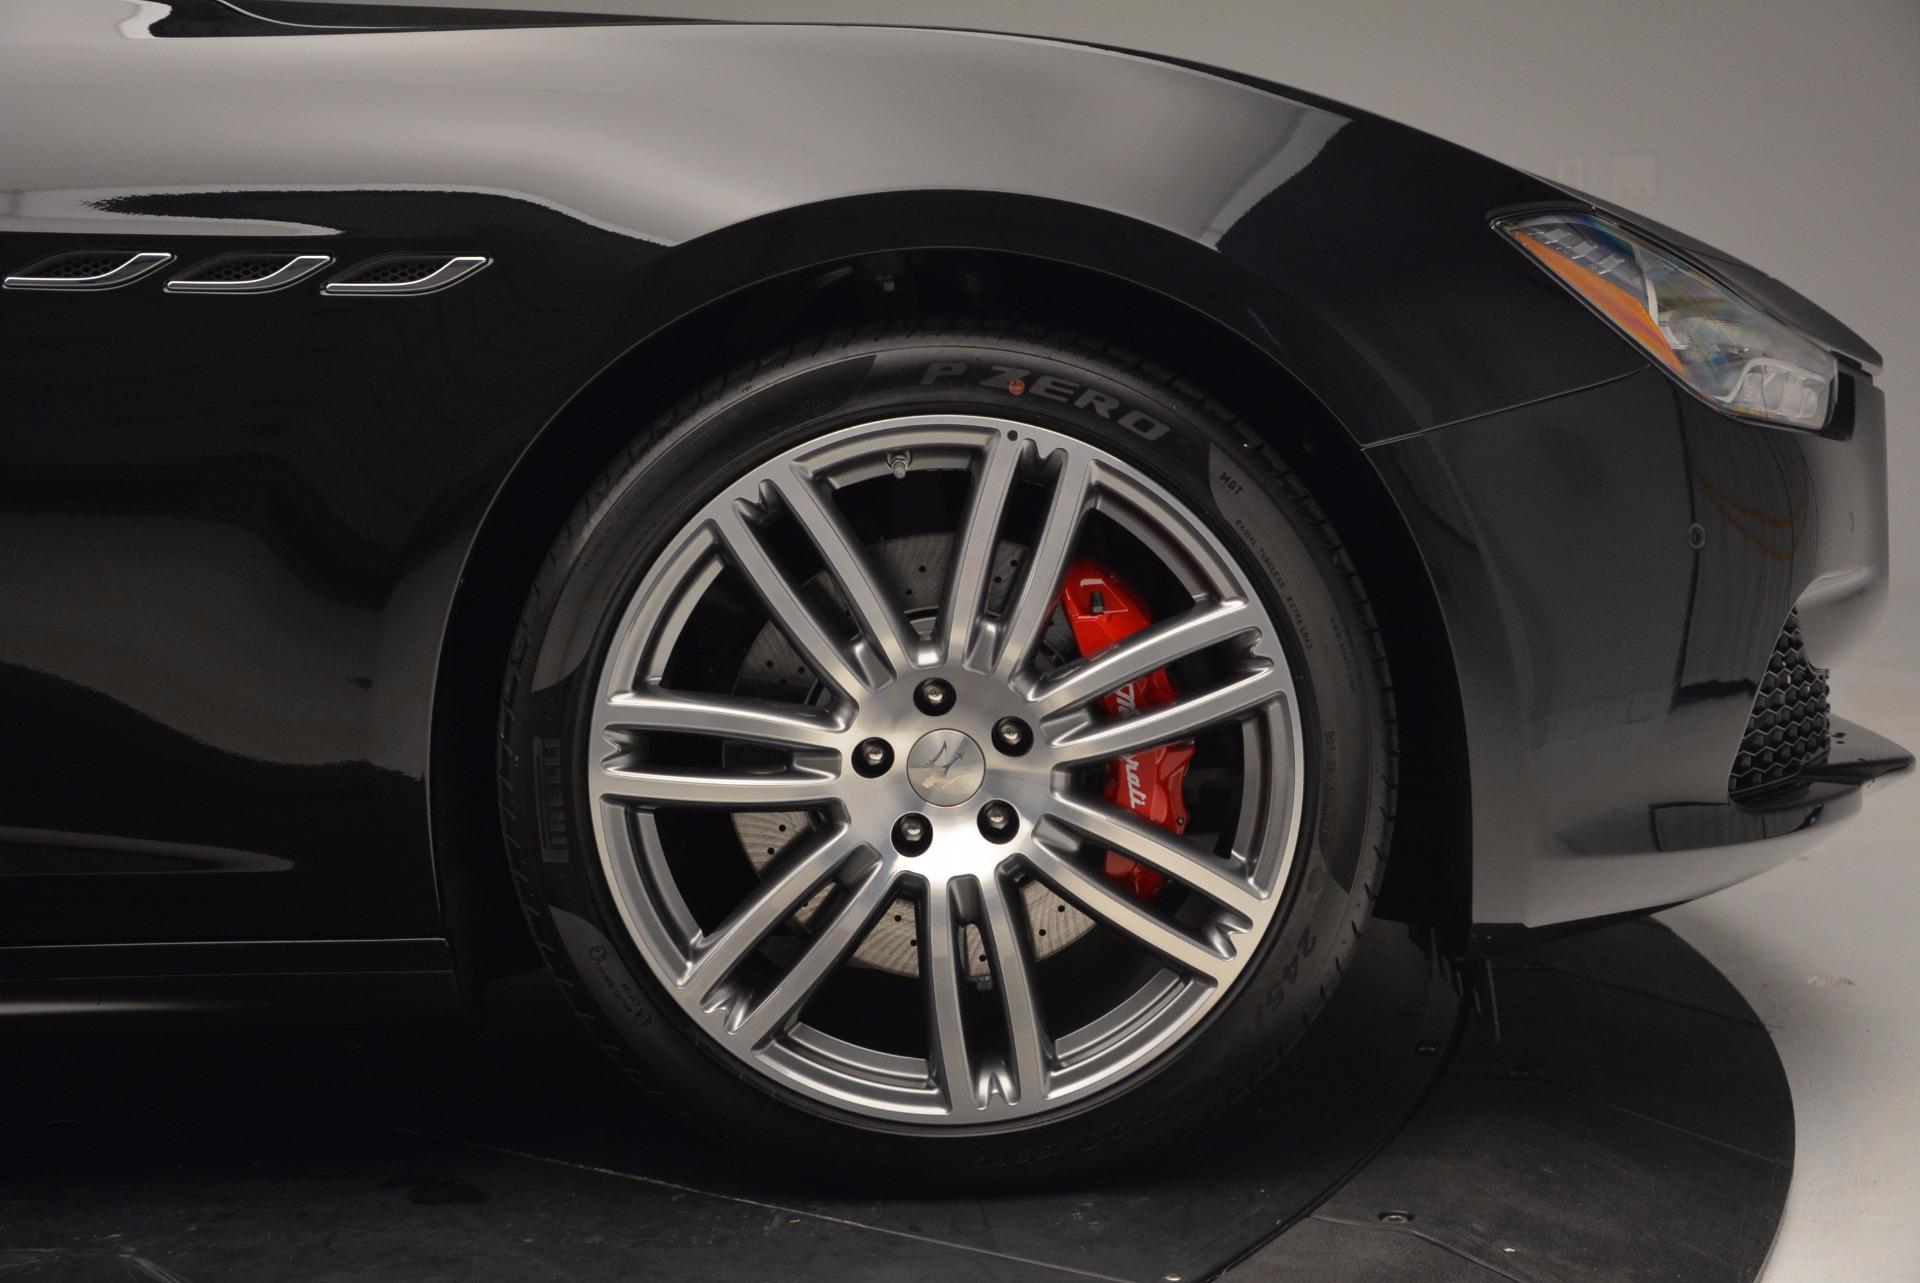 Used 2014 Maserati Ghibli S Q4 For Sale In Greenwich, CT. Alfa Romeo of Greenwich, 7281 1587_p13